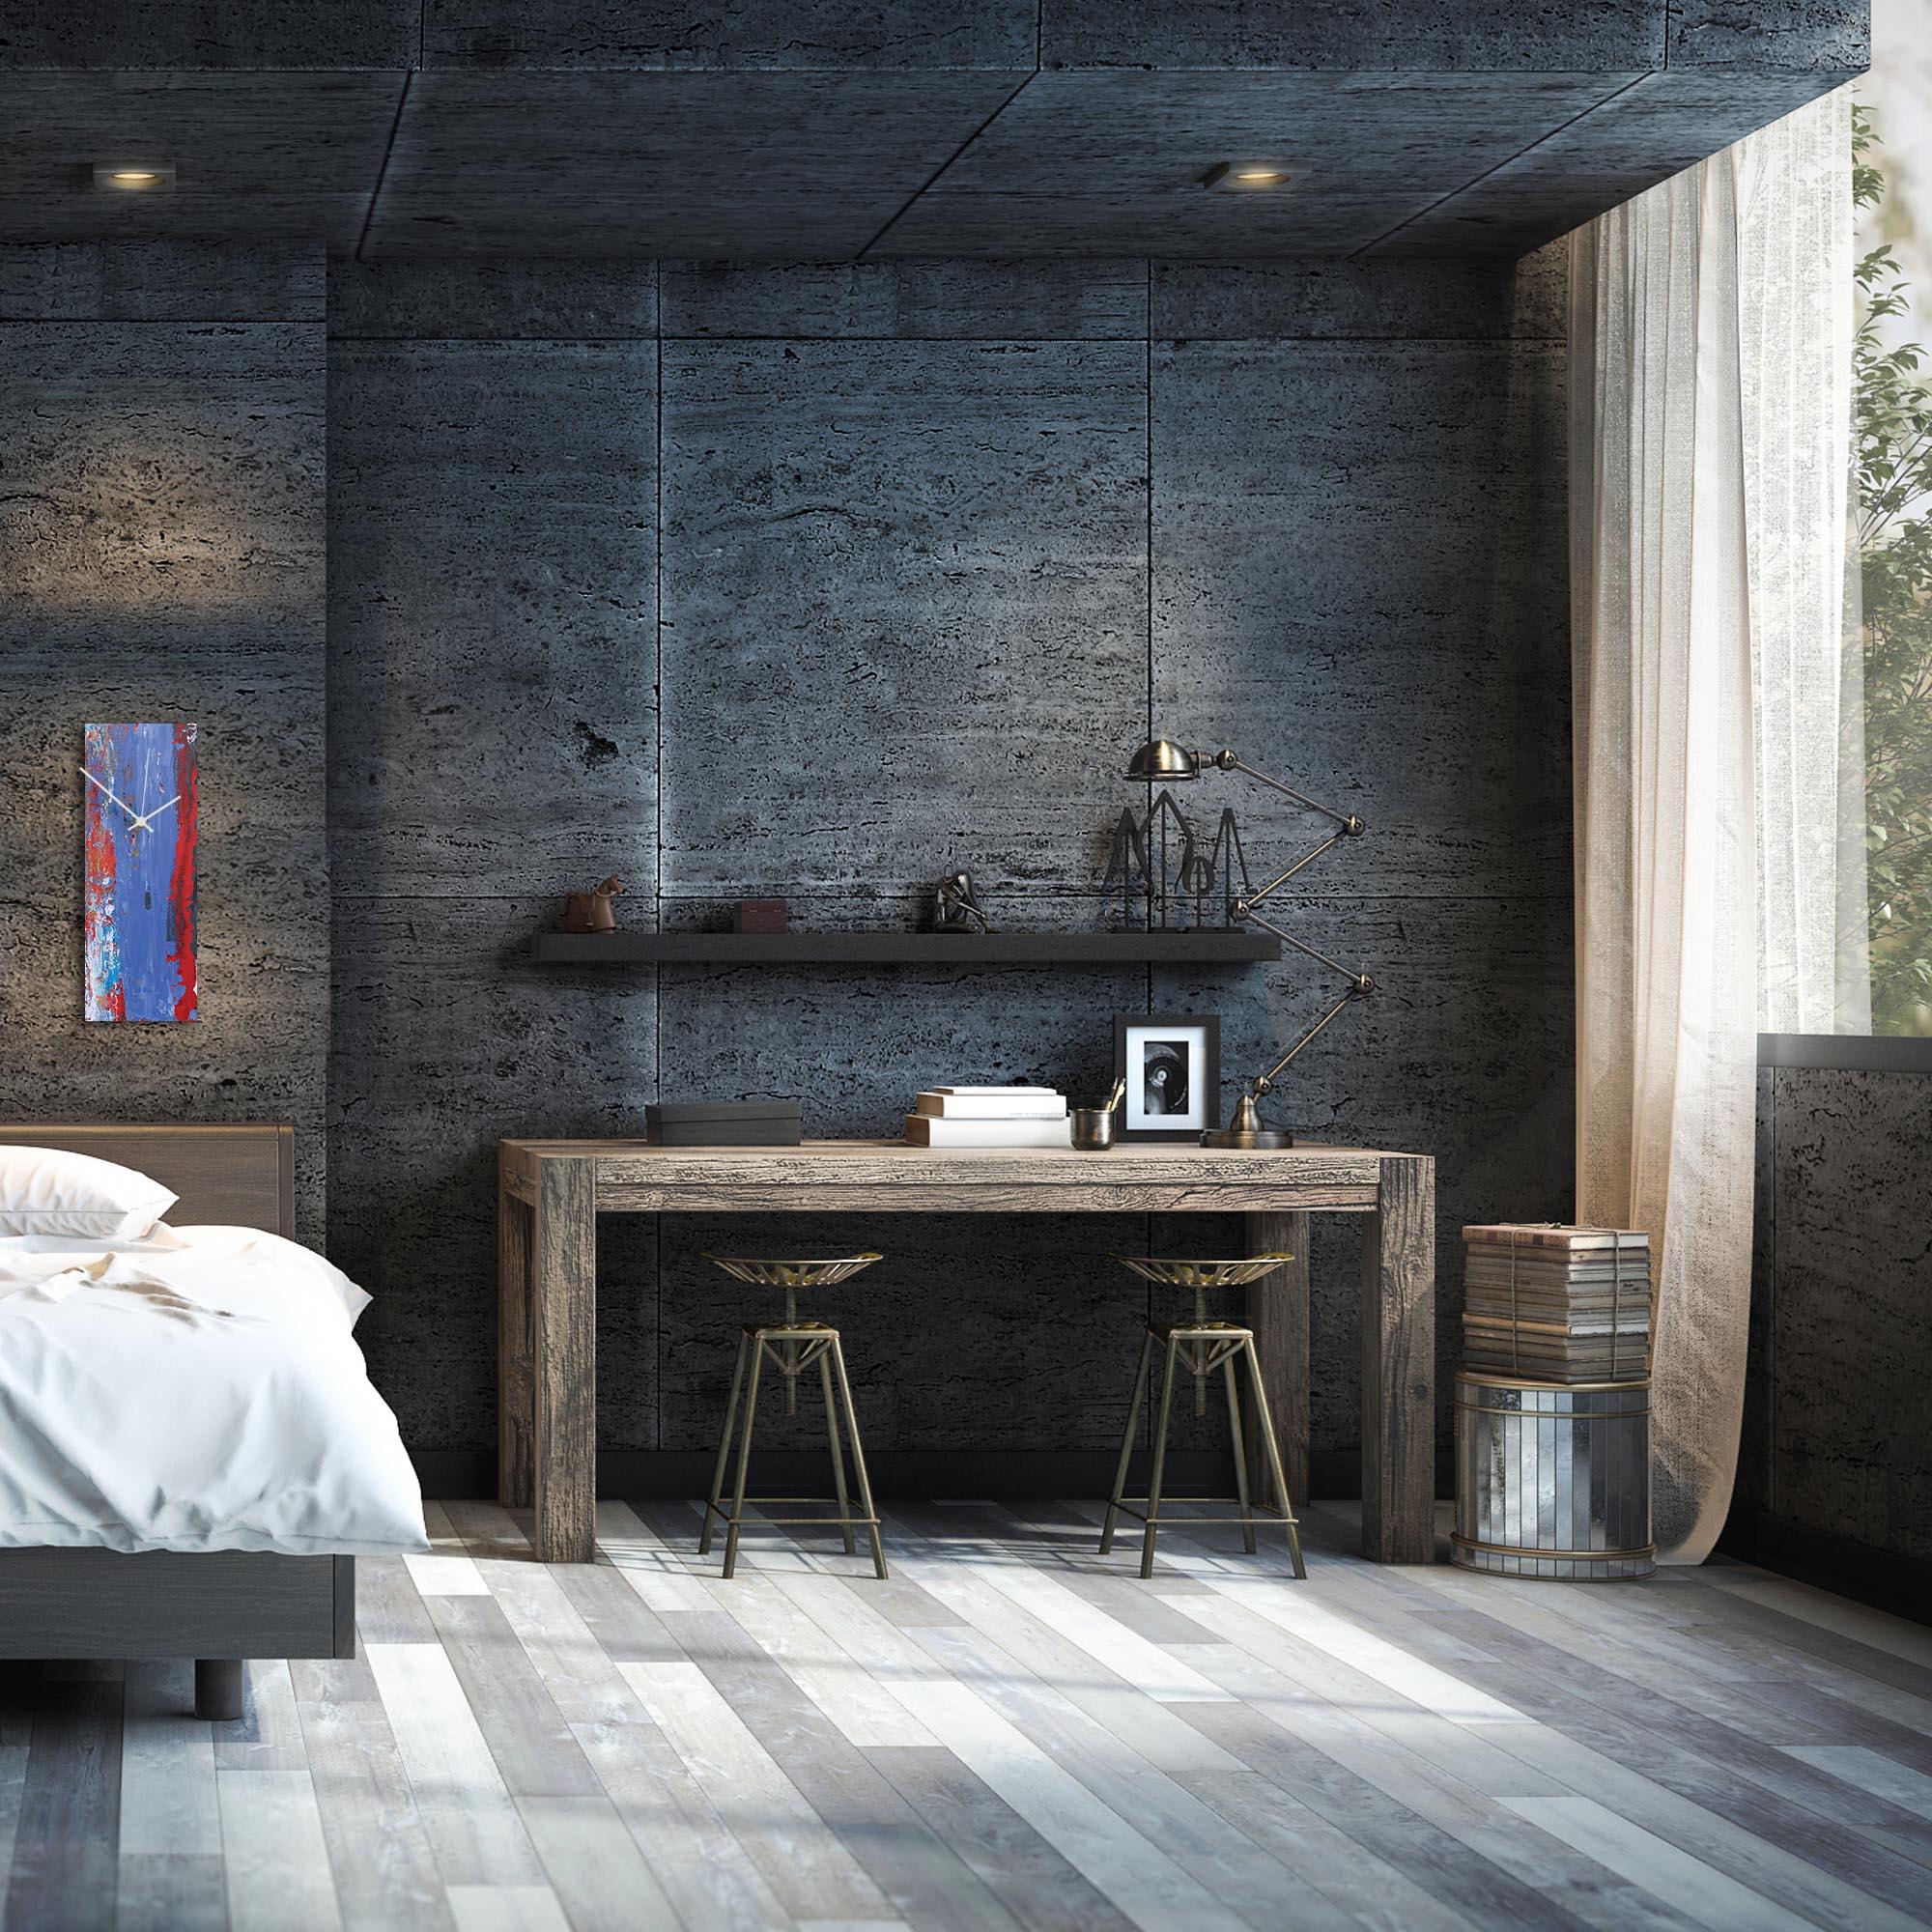 Urban Cool v3 Clock by Elana Reiter Modern Wall Clock on Metal - Alternate View 1